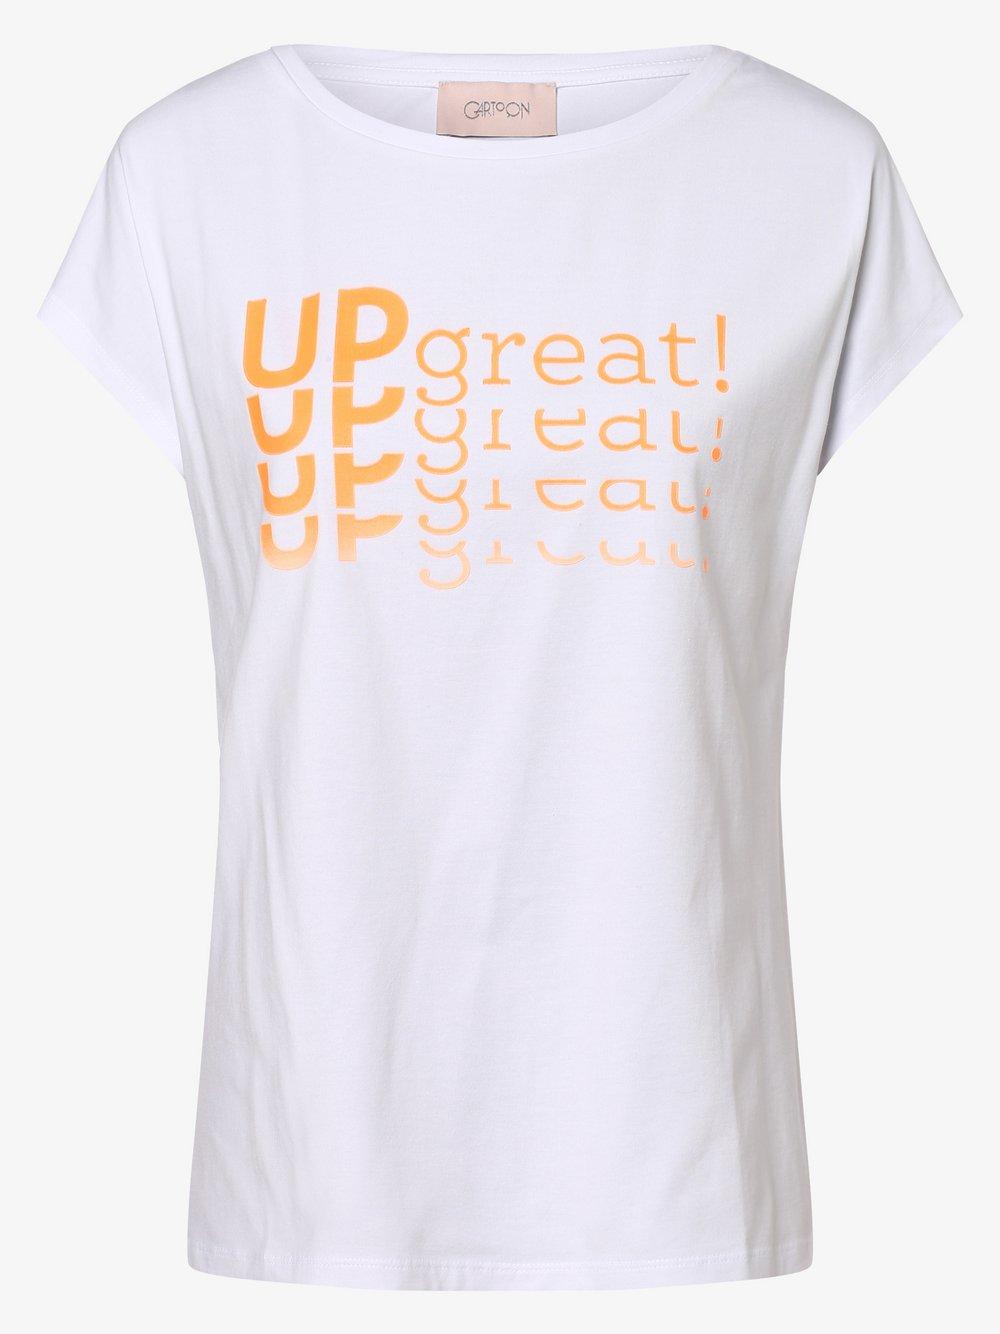 Cartoon UPgreat! - T-shirt damski, biały